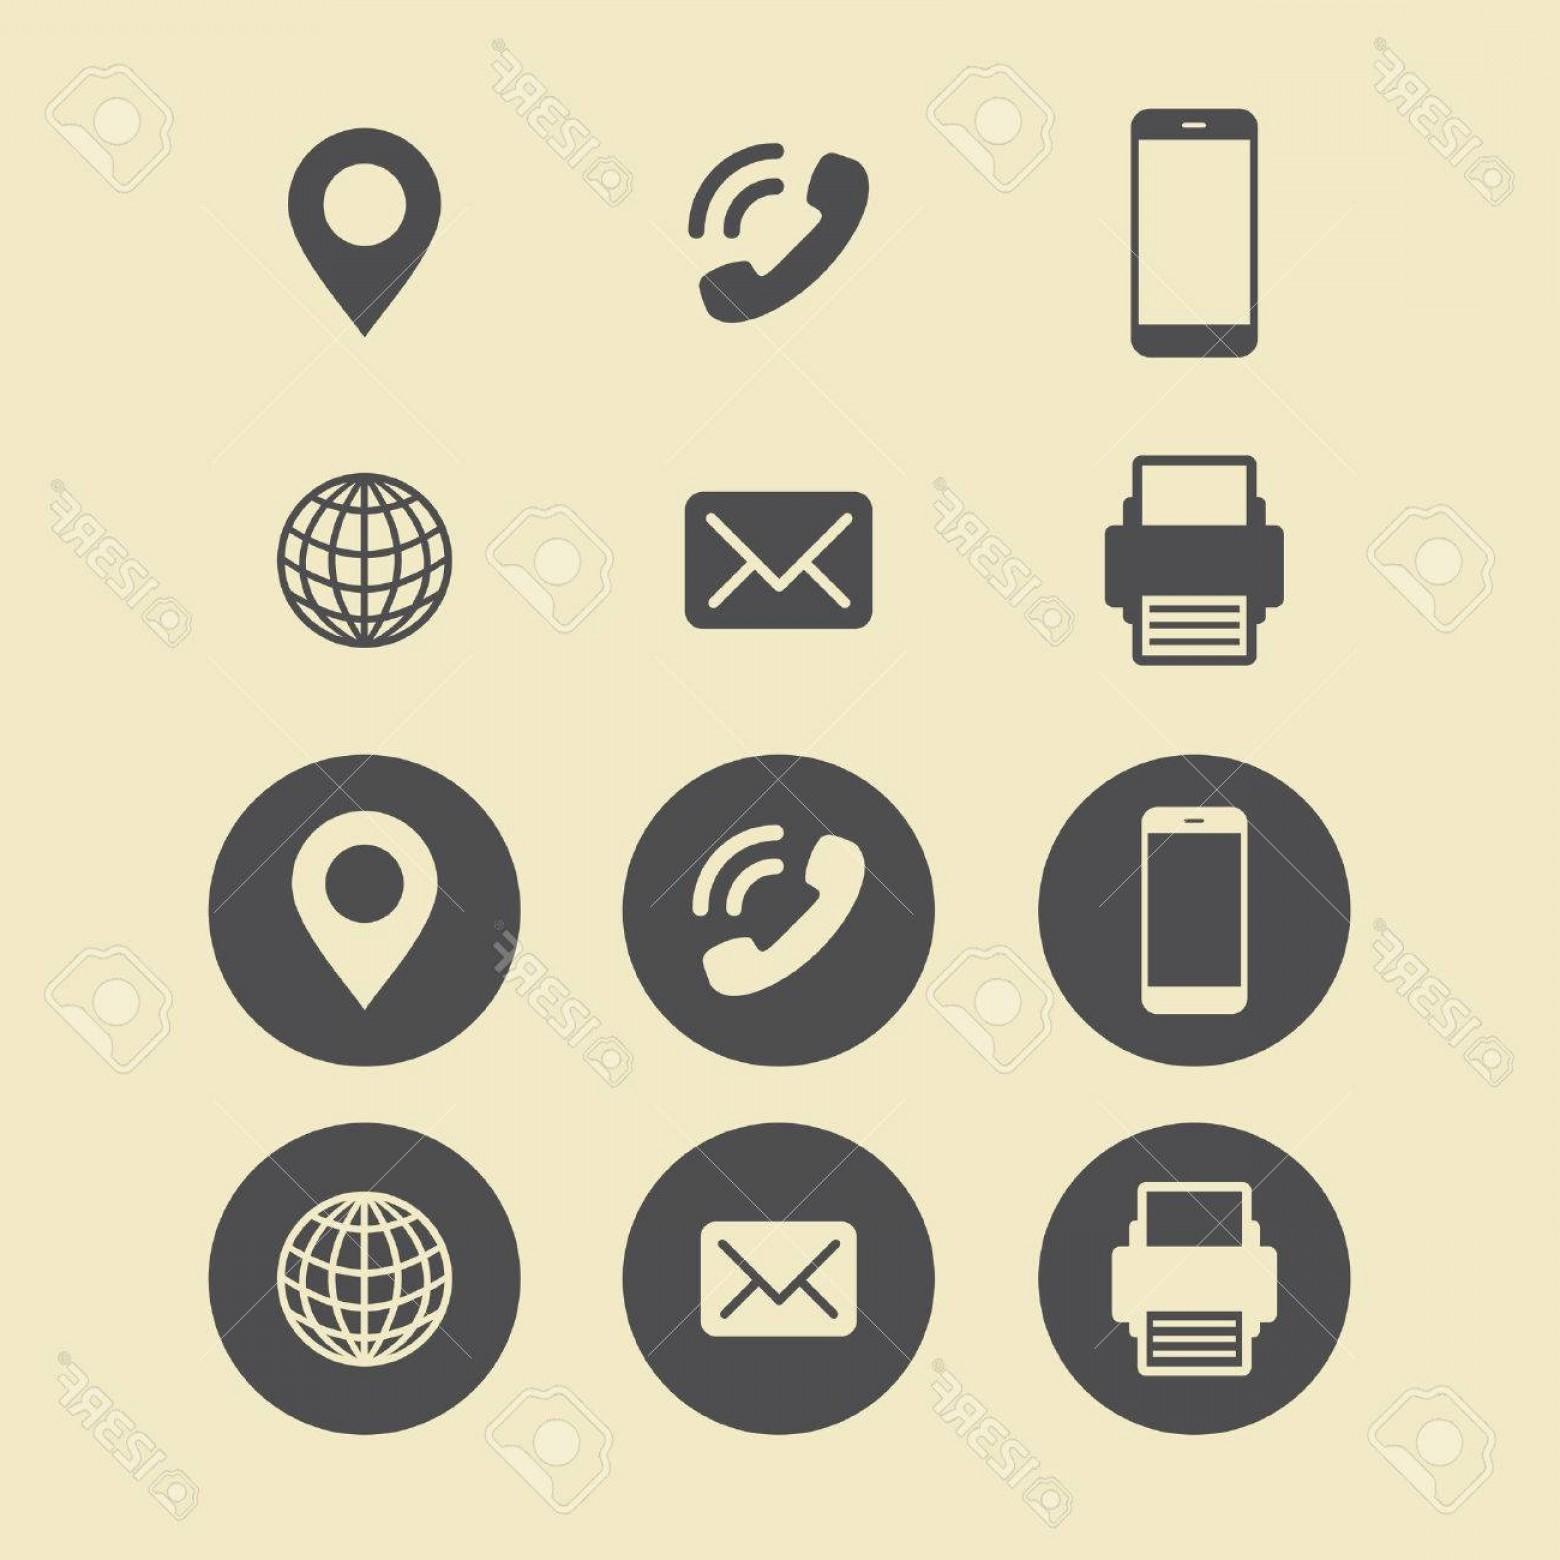 1560x1560 Photostock Vector Business Card Icon Set Web Icons Shopatcloth